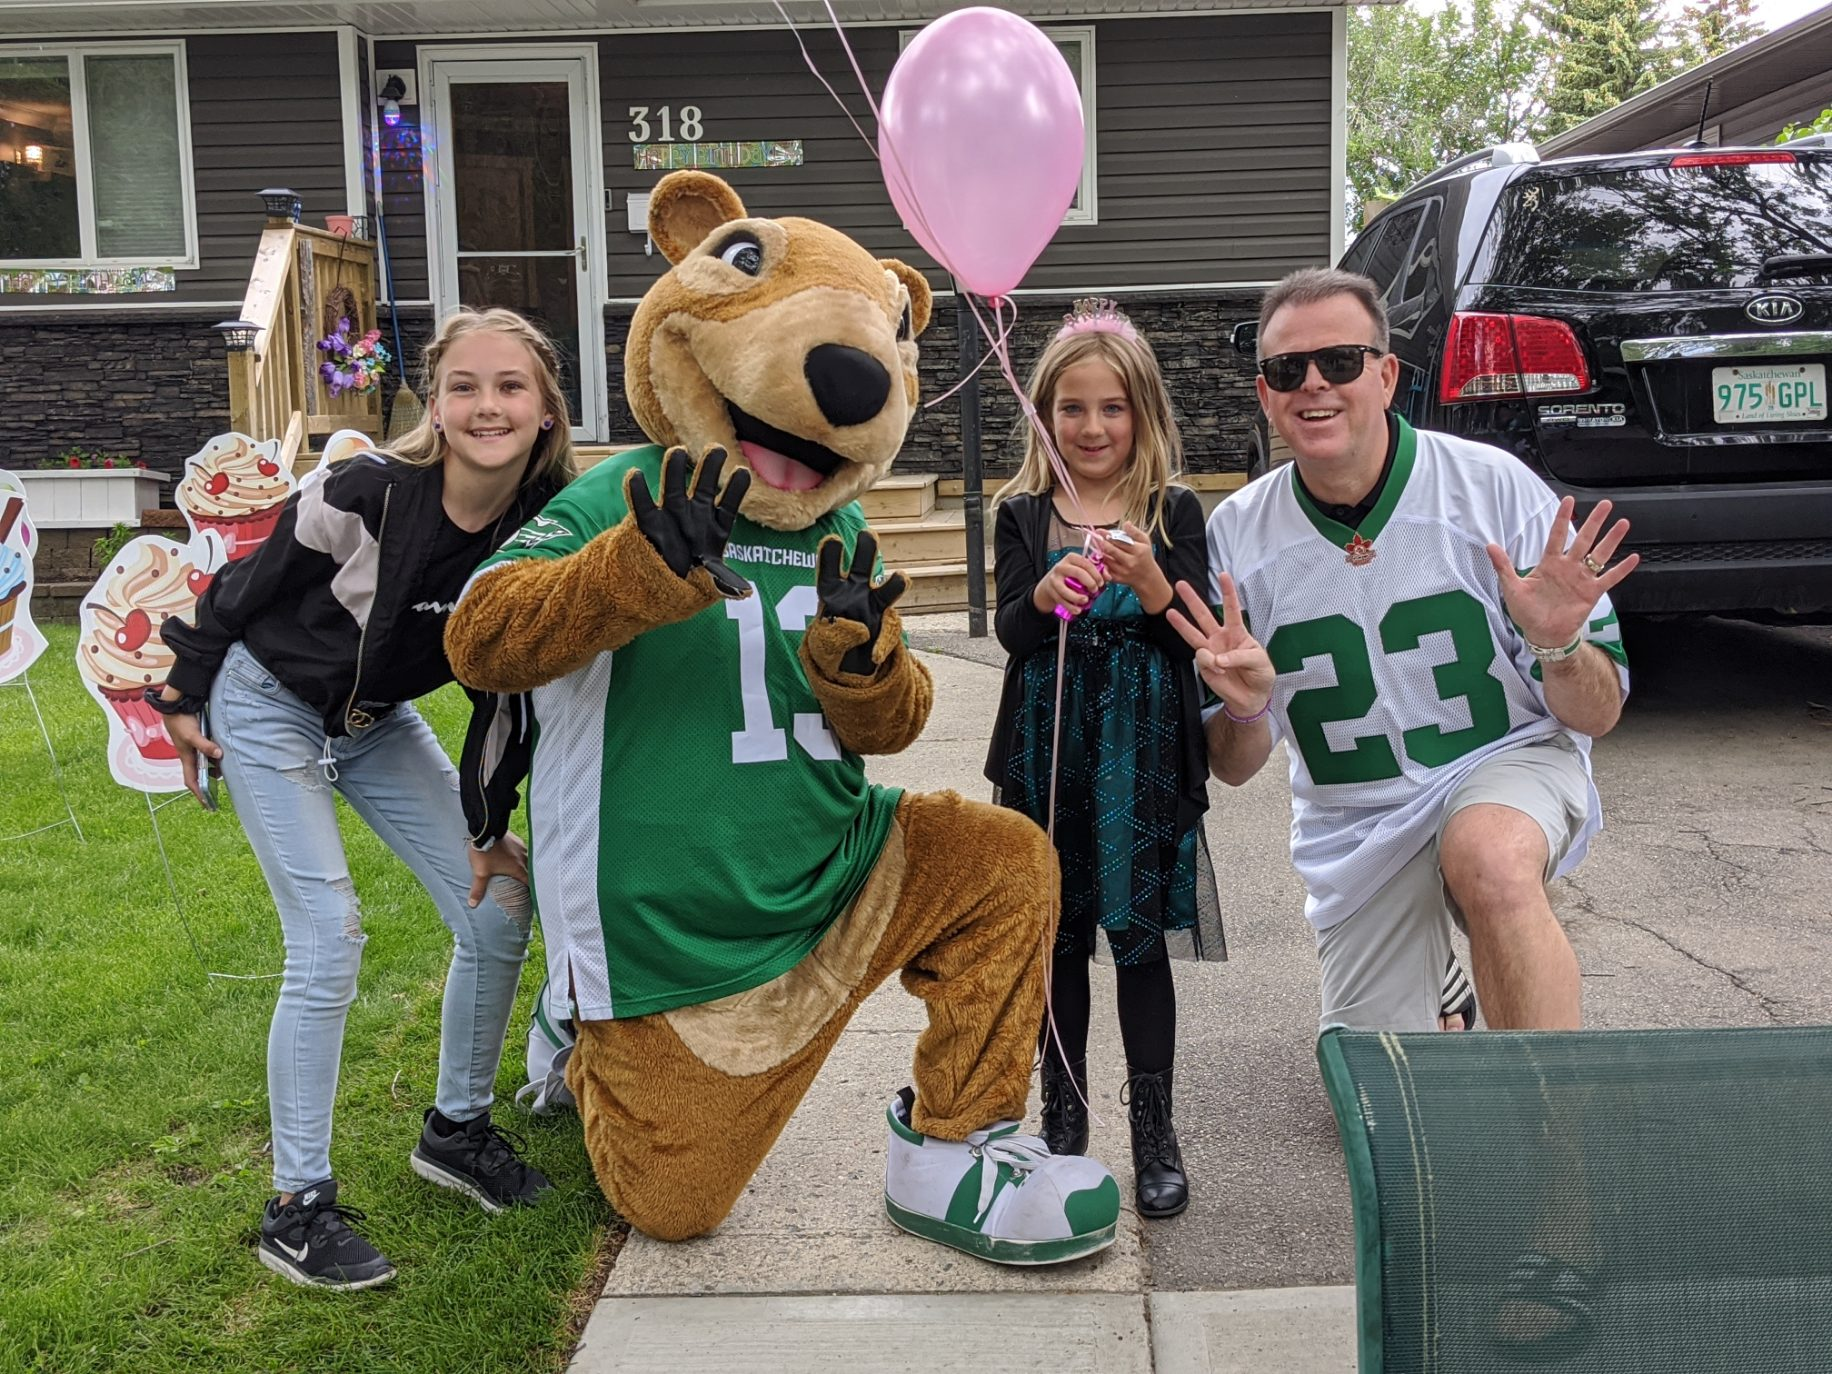 Saskatchewan Roughriders mascott with kids